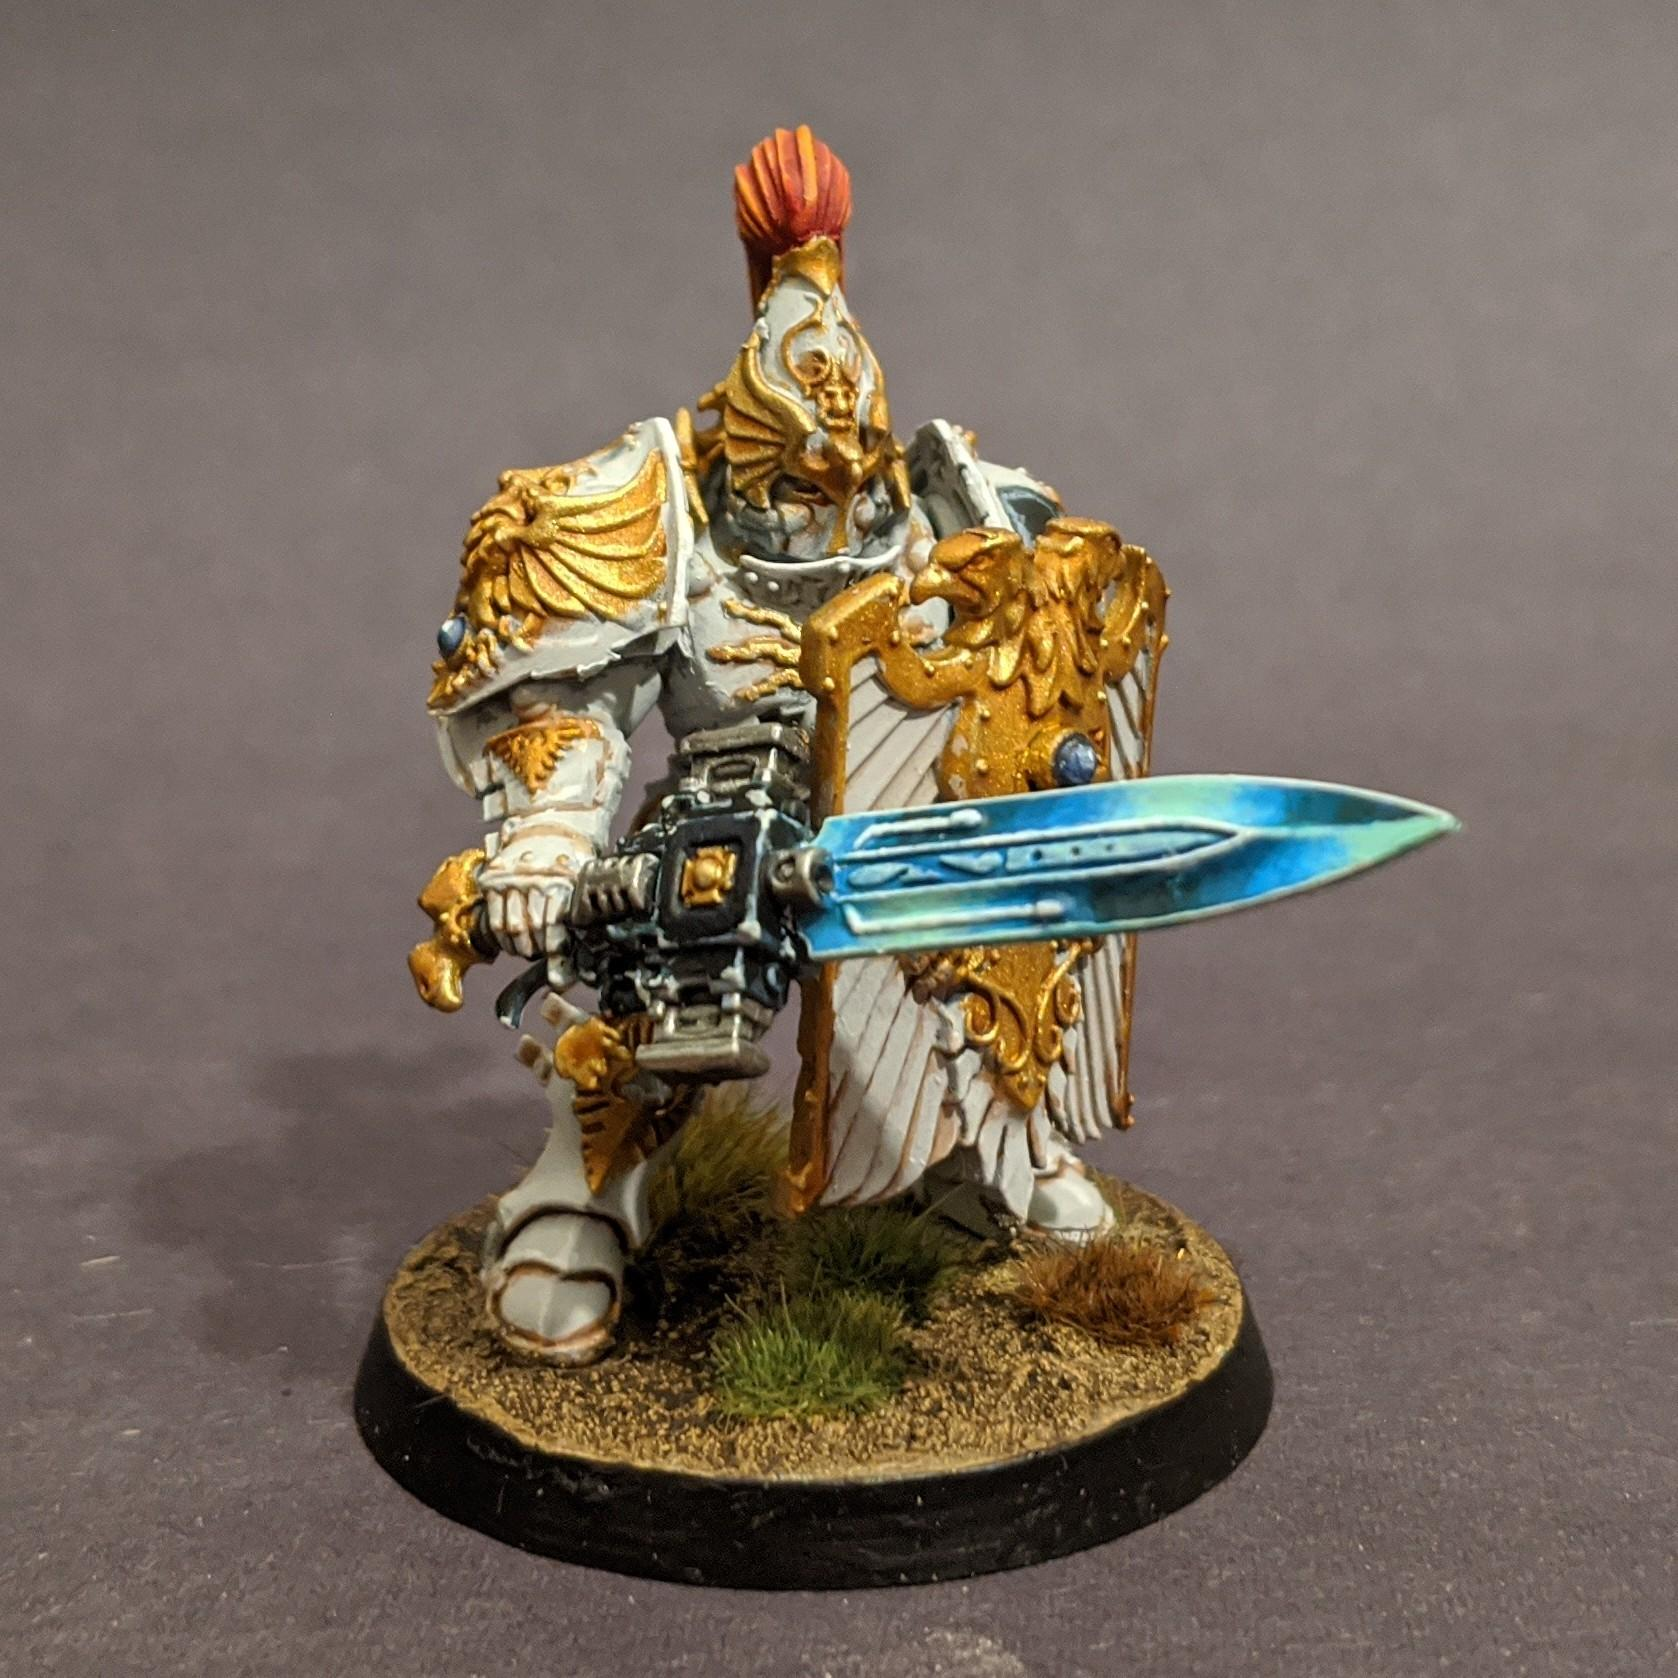 Blue Power Sword, Custodes, Power Sword, Sentinel Blade, Solar Watch